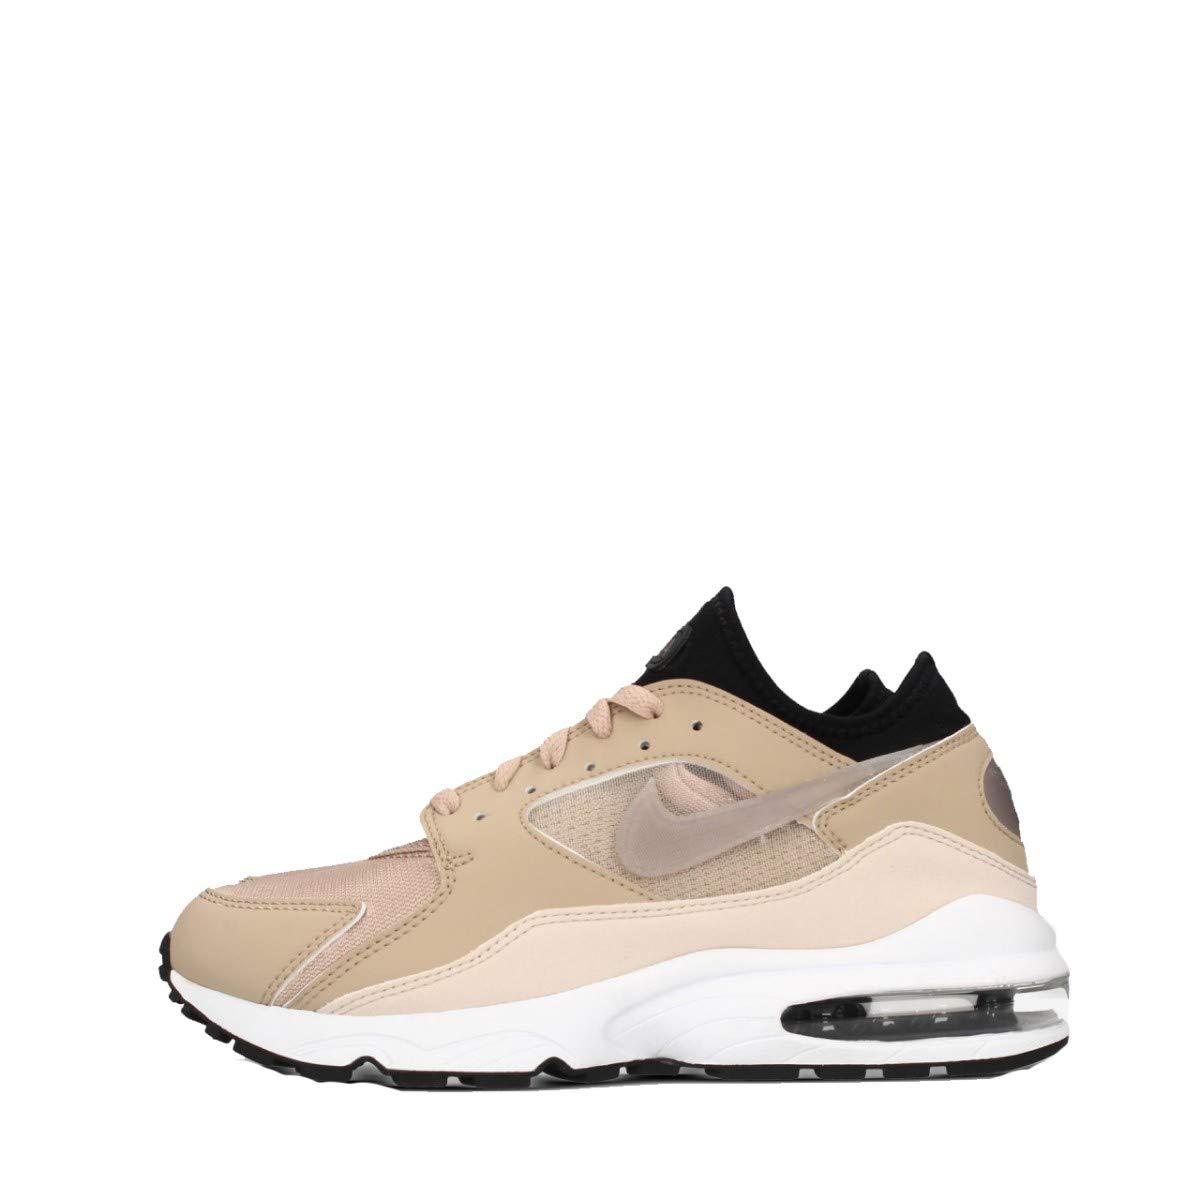 Mehrfarbig (Sand Sepia Stone Desert Sand Weiß 202) Nike Herren Air Max 93 Laufschuhe